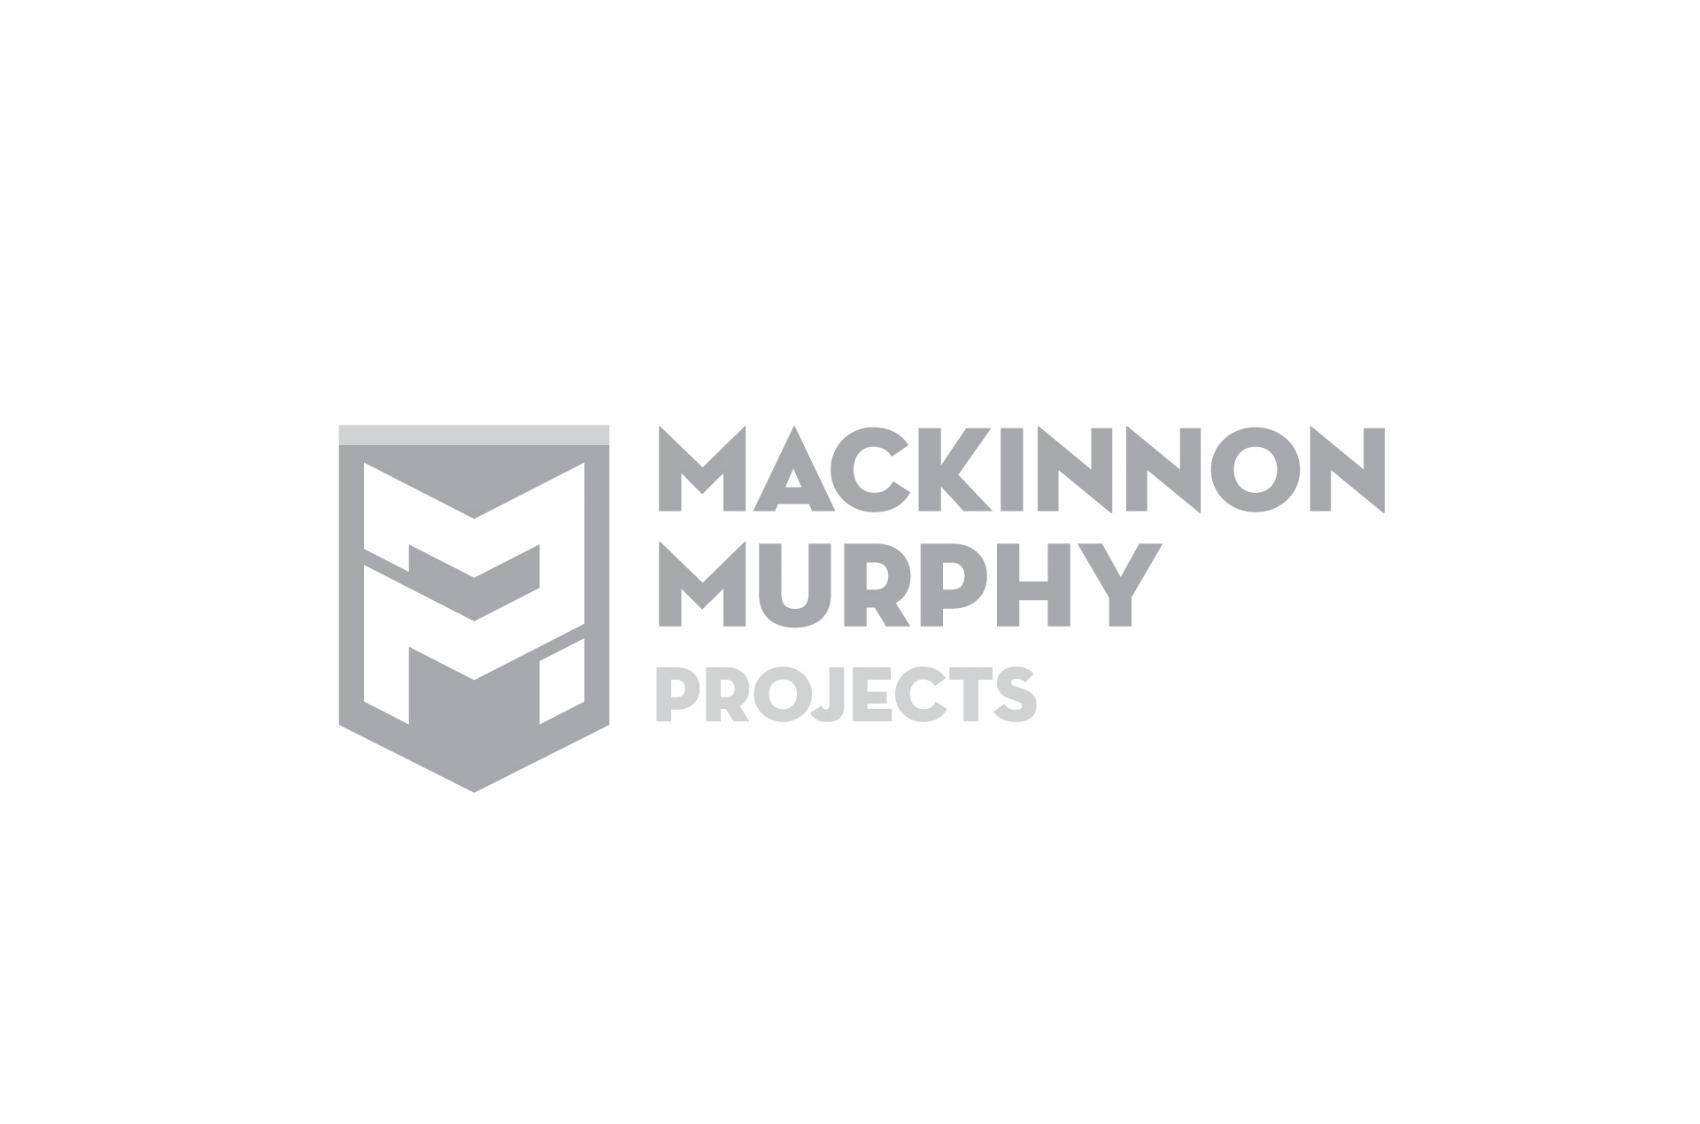 MacMur-logo-grey.jpg